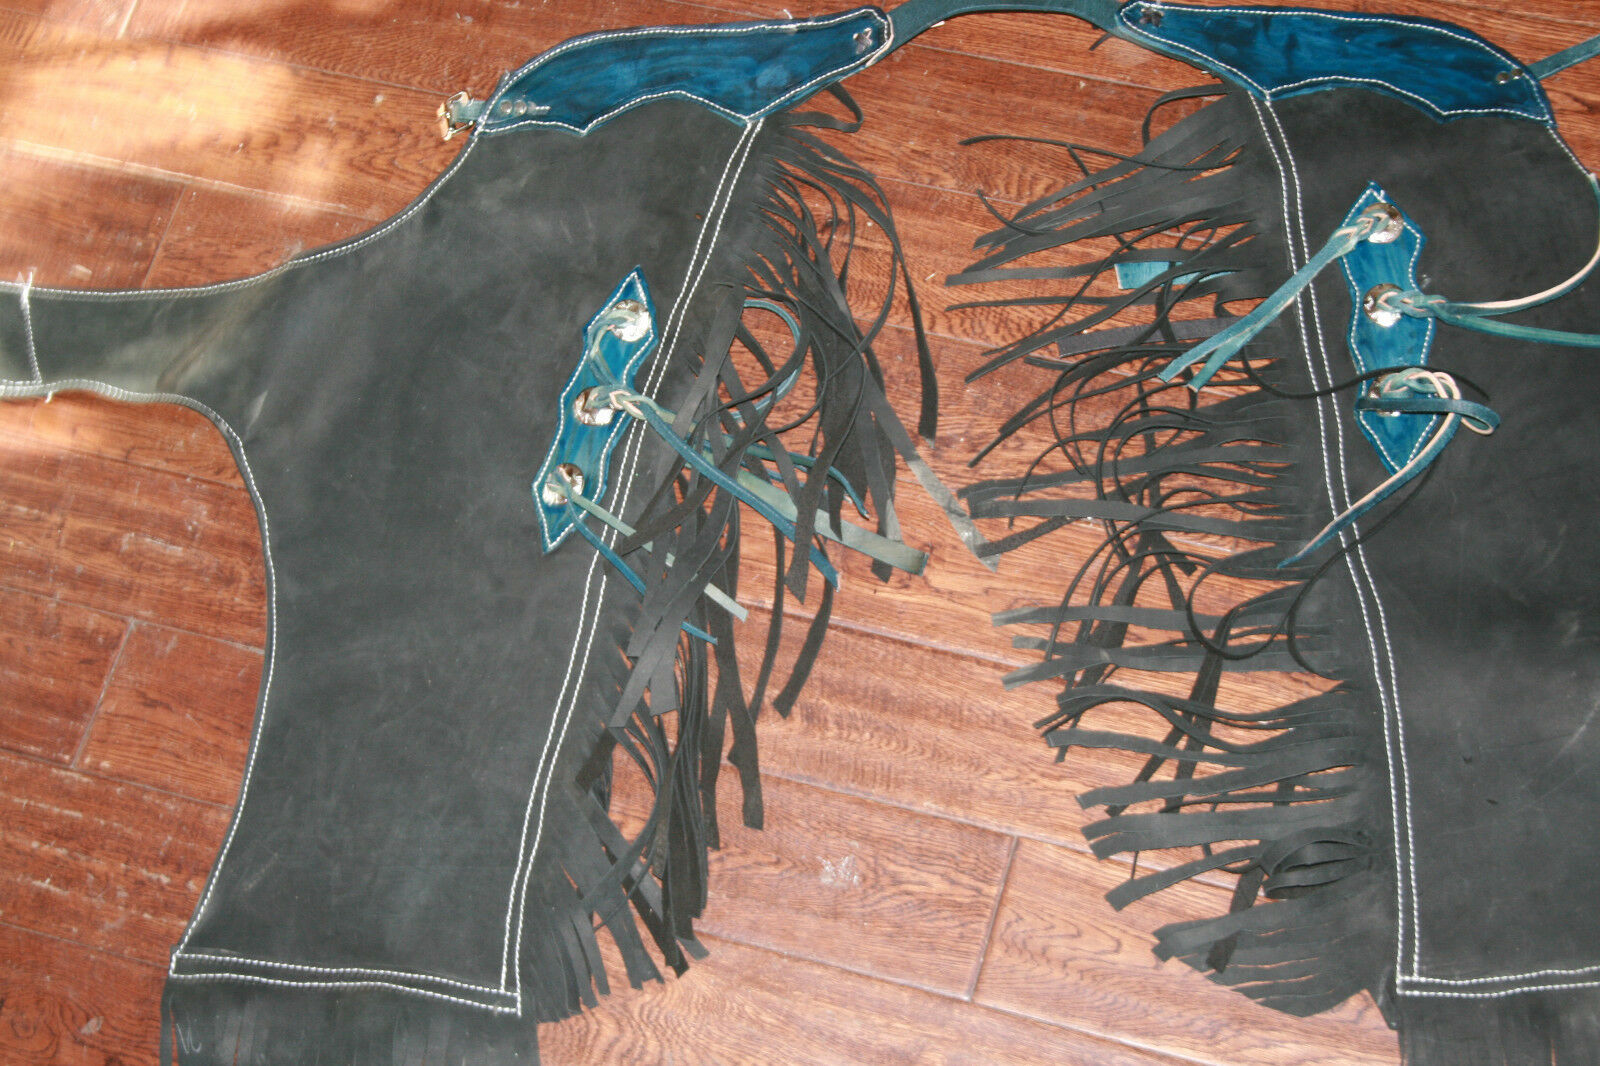 Paquete de montar toros Gear Toro Equitación Chaps Bull Cuerda Bullrope Rodeo Chaps Gear